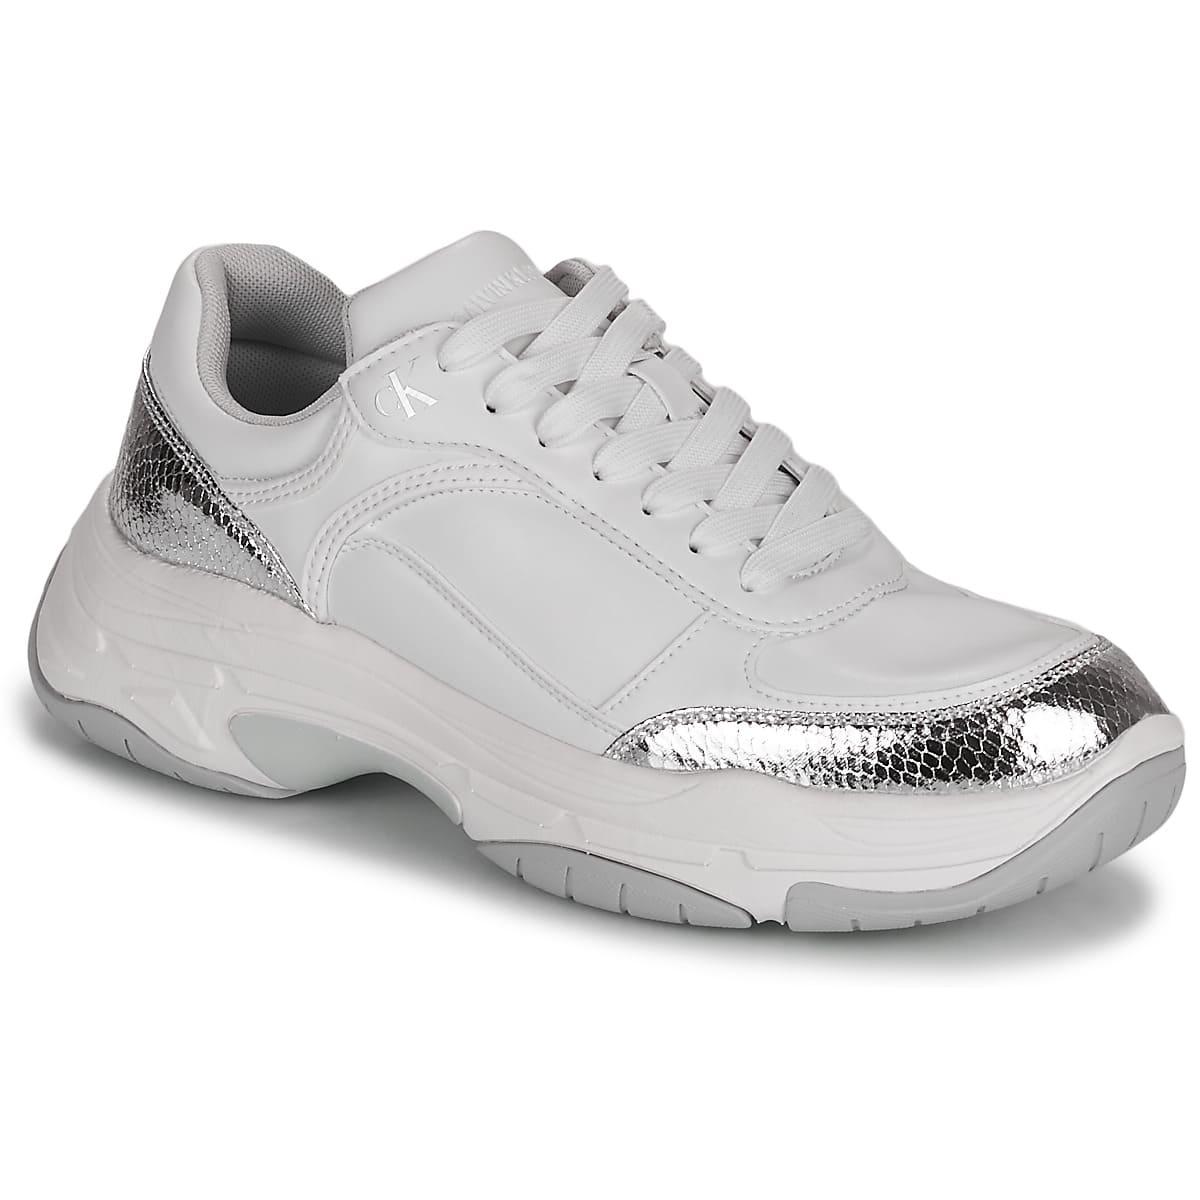 Trendiga chunky sneakers med silver detaljer